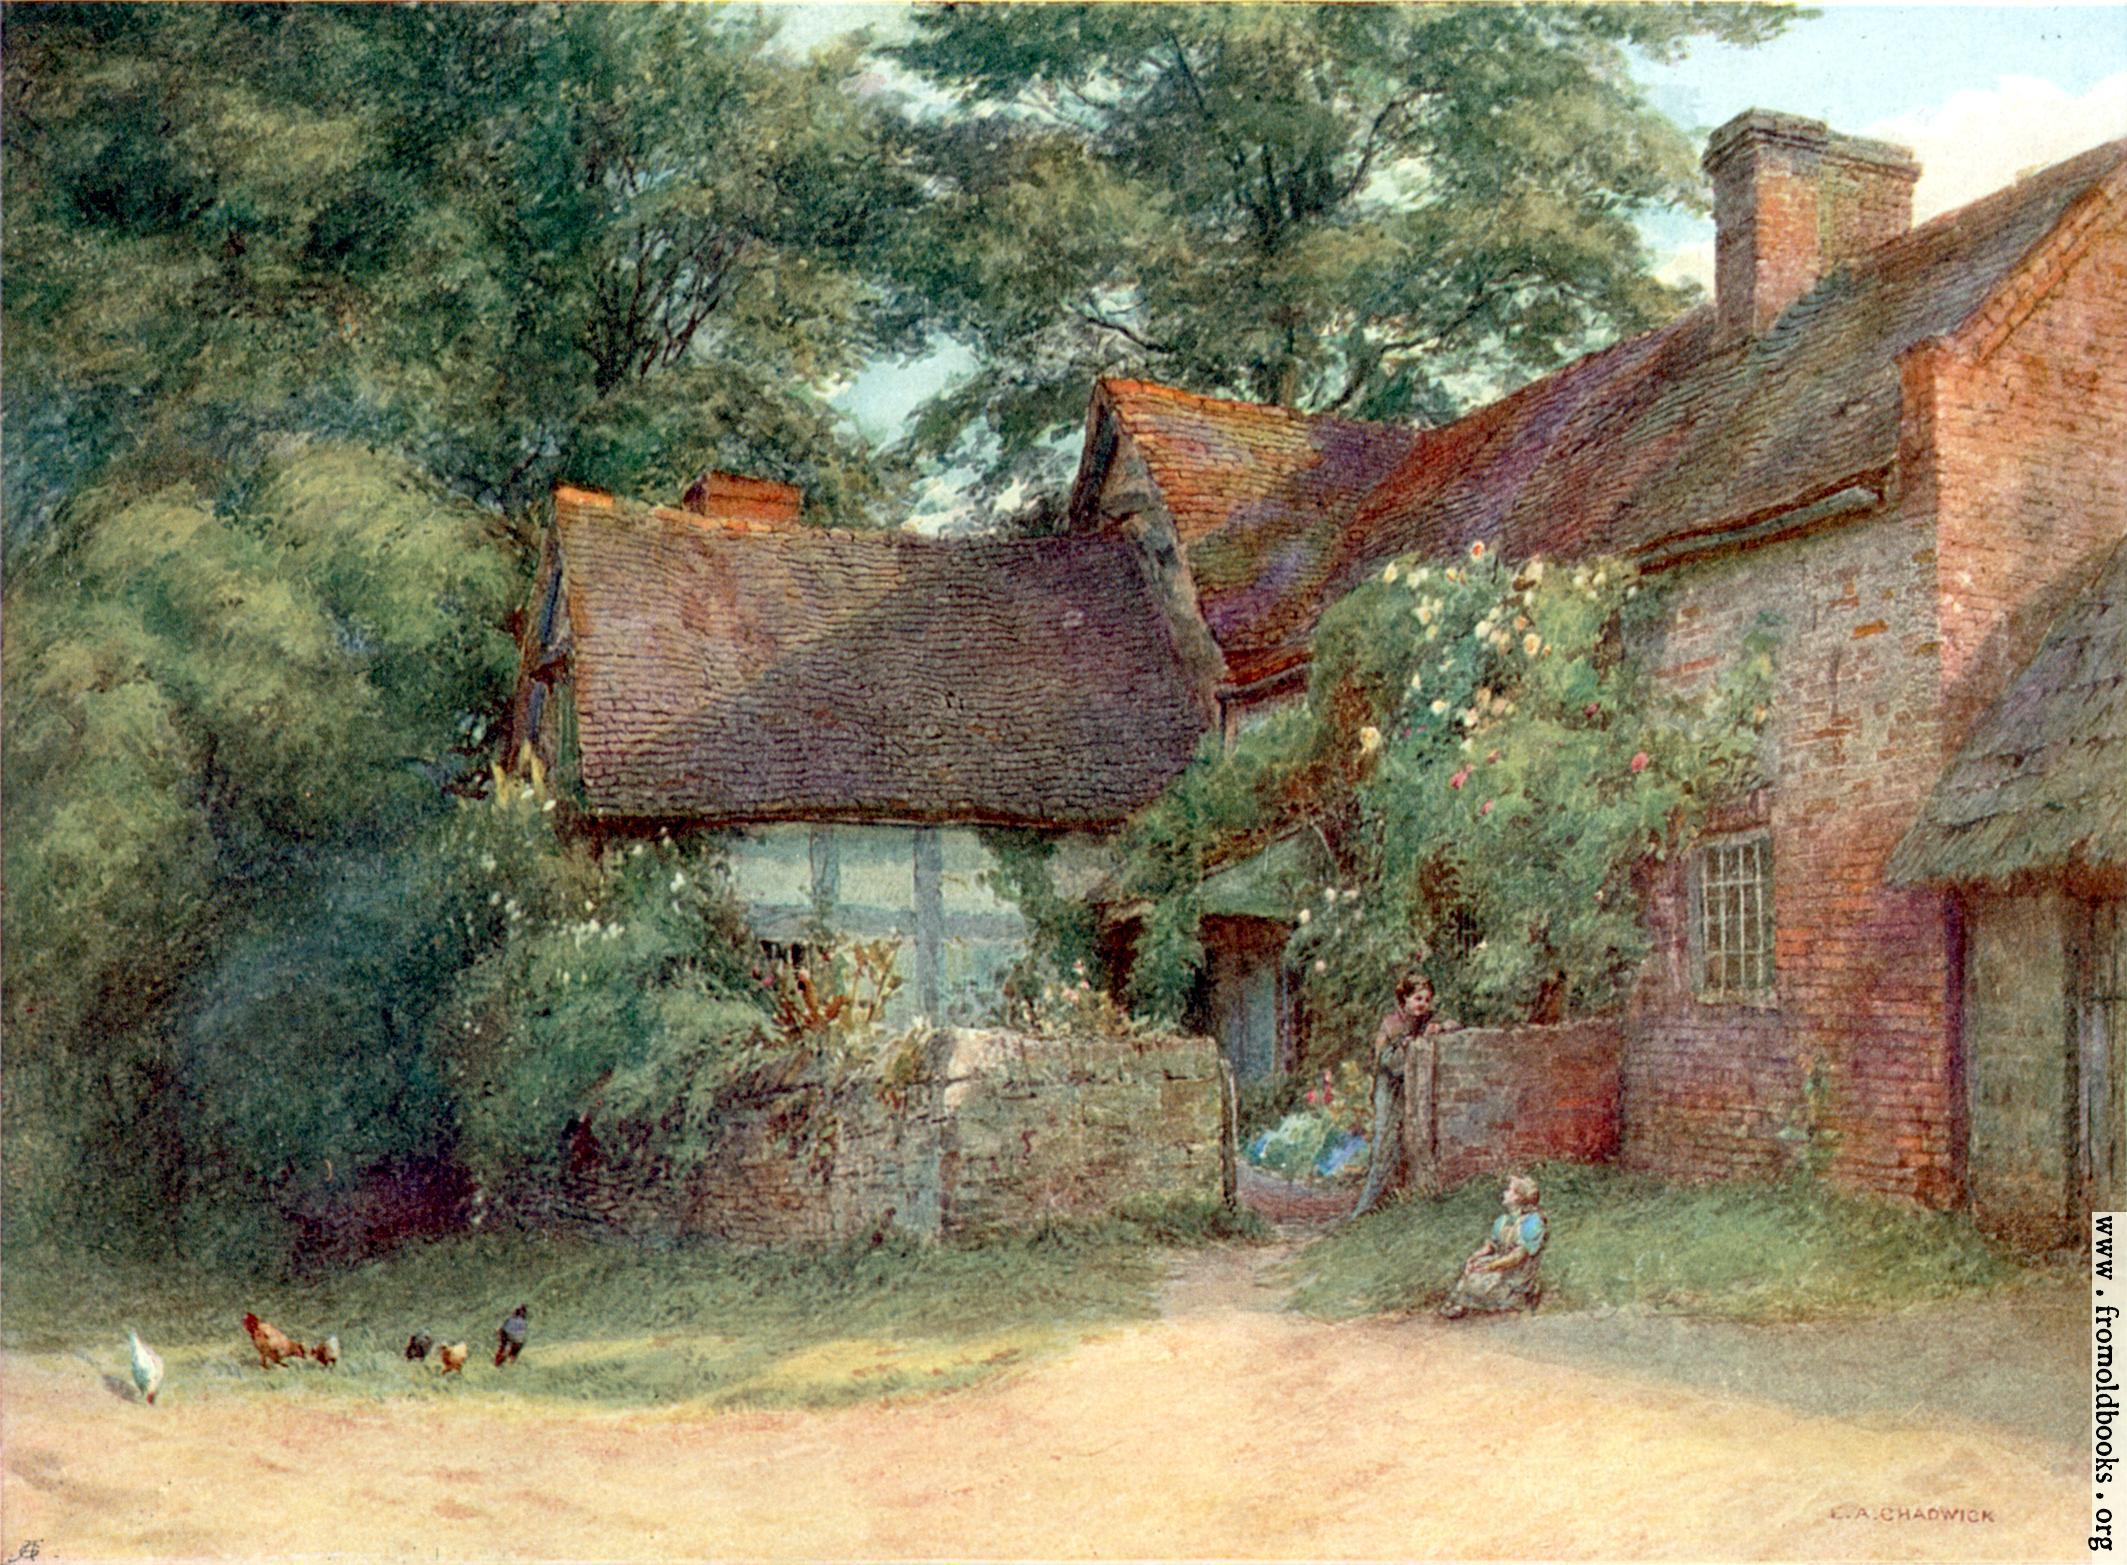 Suckley Worcestershire